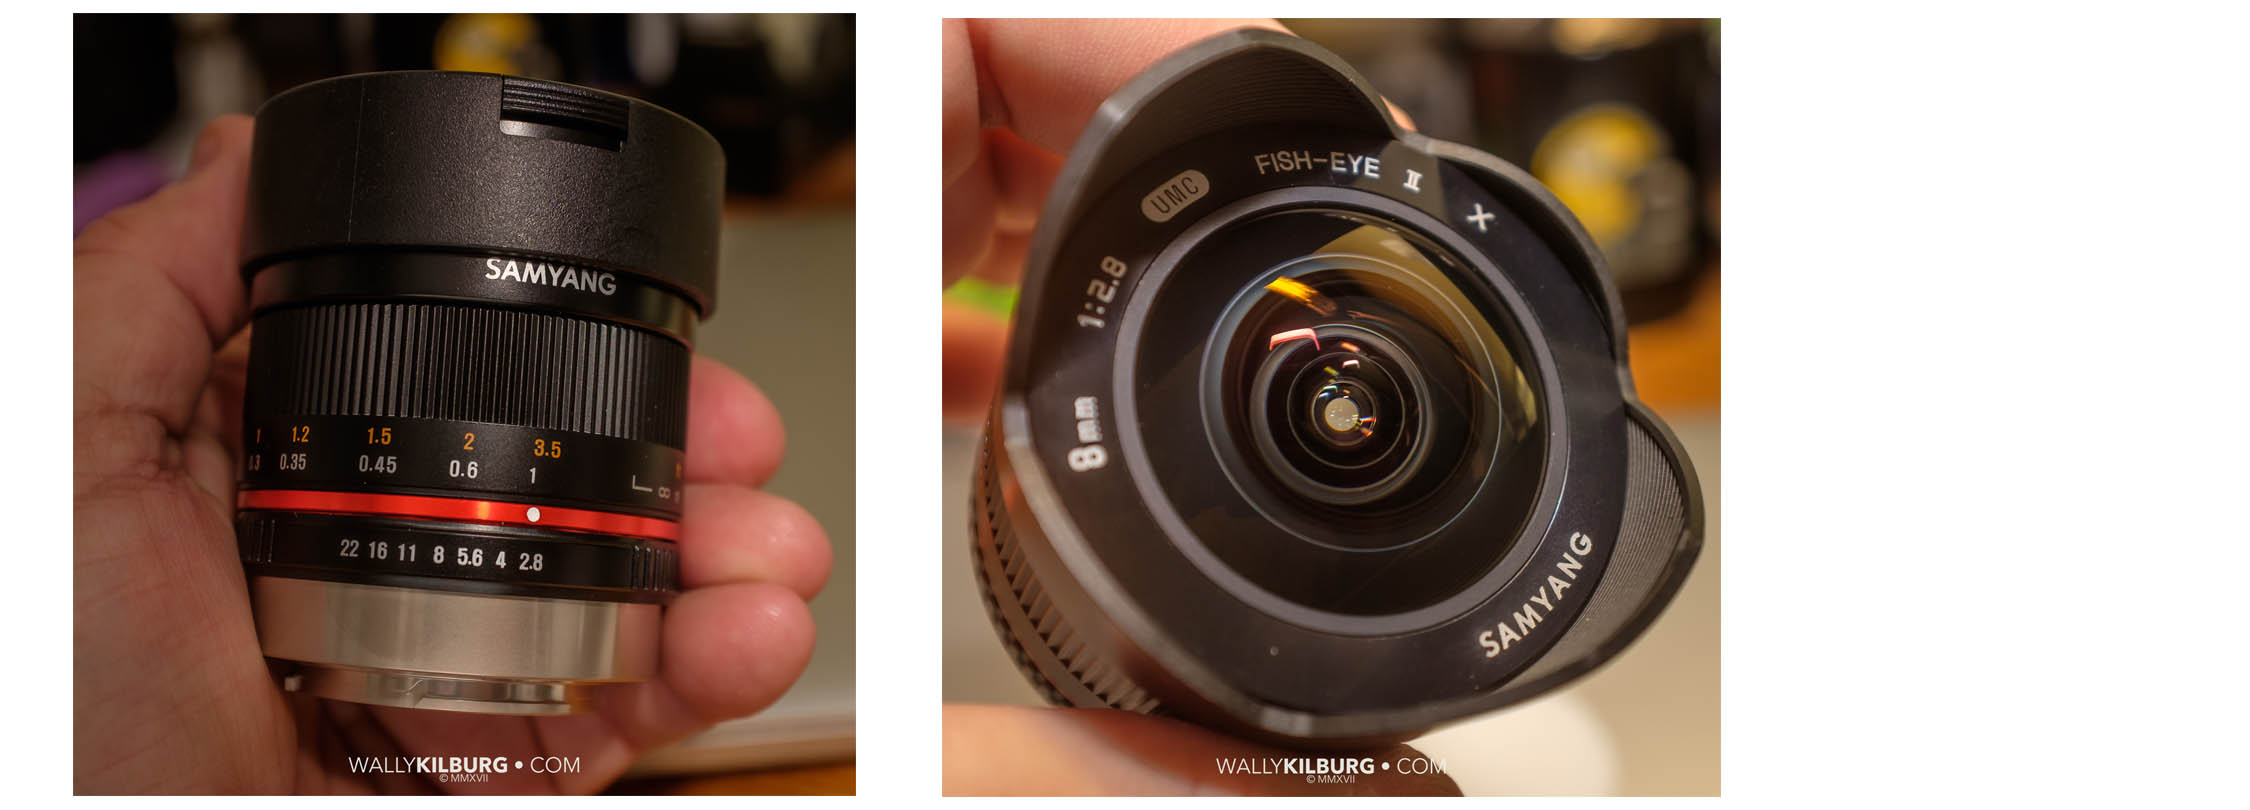 Samyang 8mm.jpg